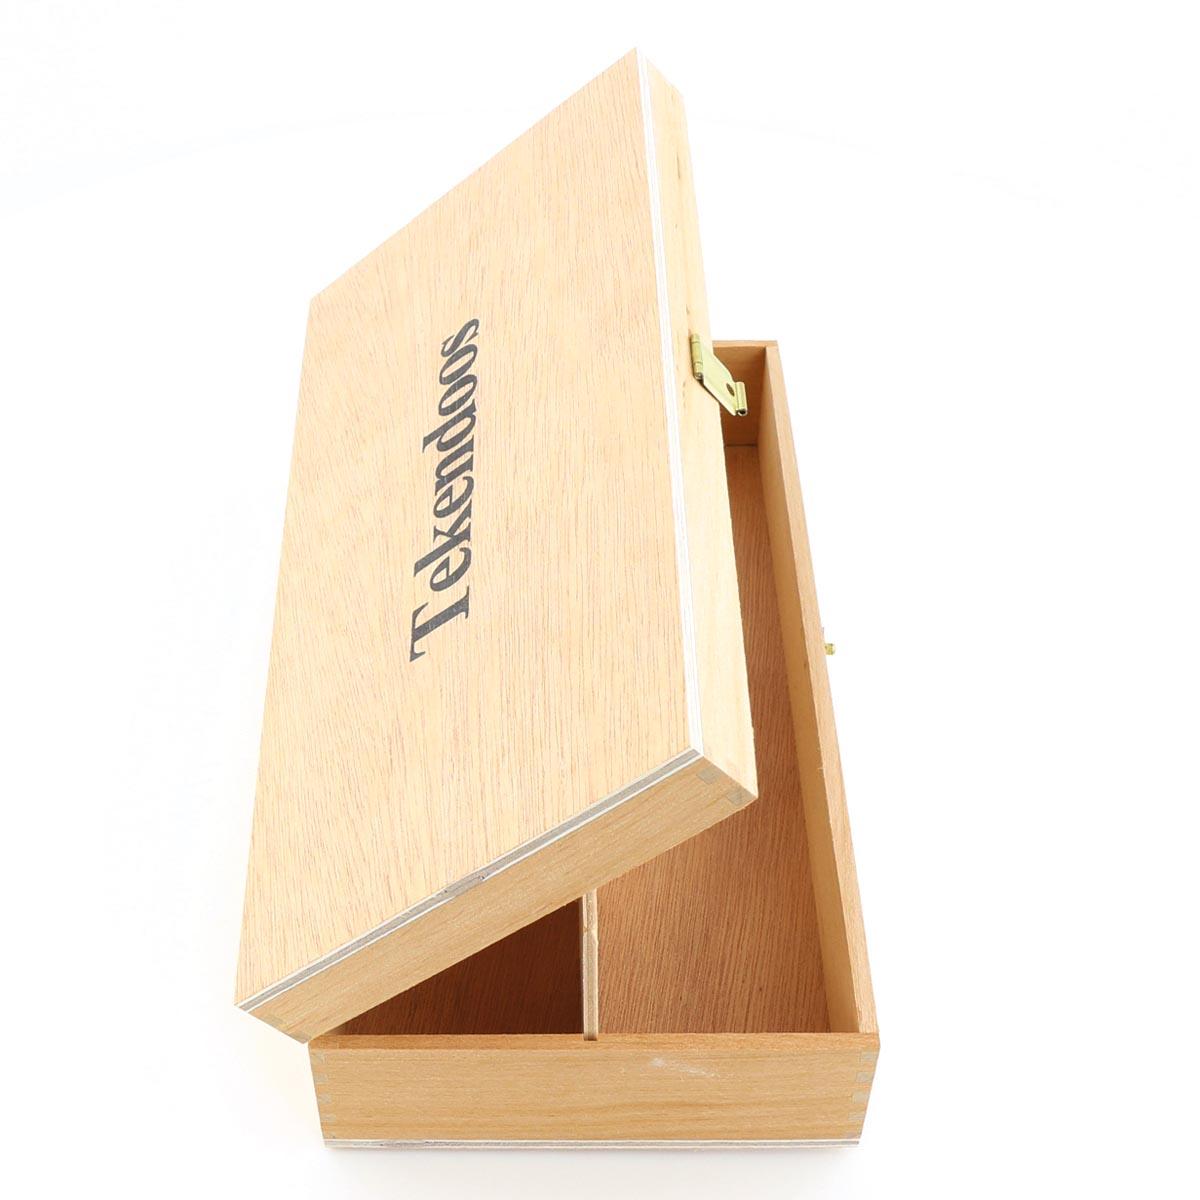 Kangaro houten tekendoos